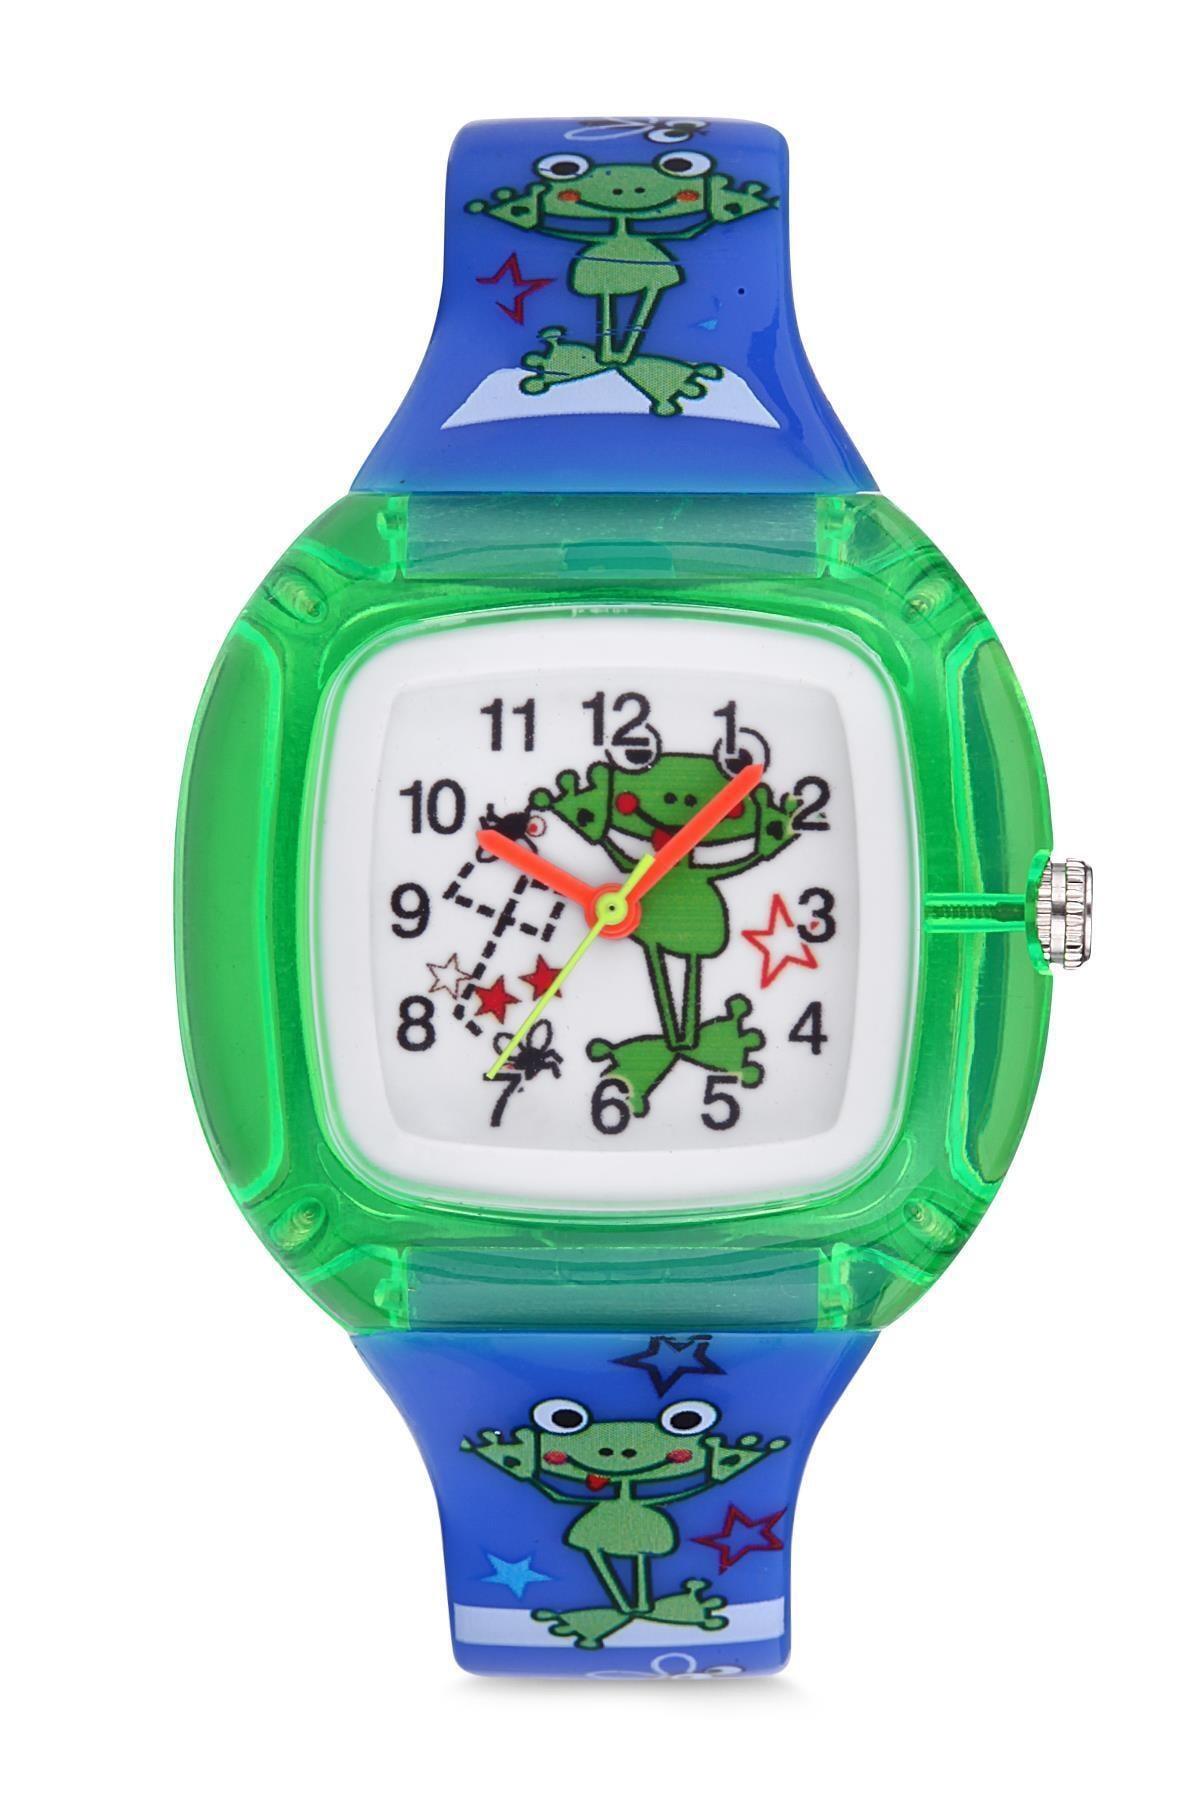 فروش پستی ساعت بچه گانه شیک جدید برند WatchArt رنگ آبی کد ty50729264